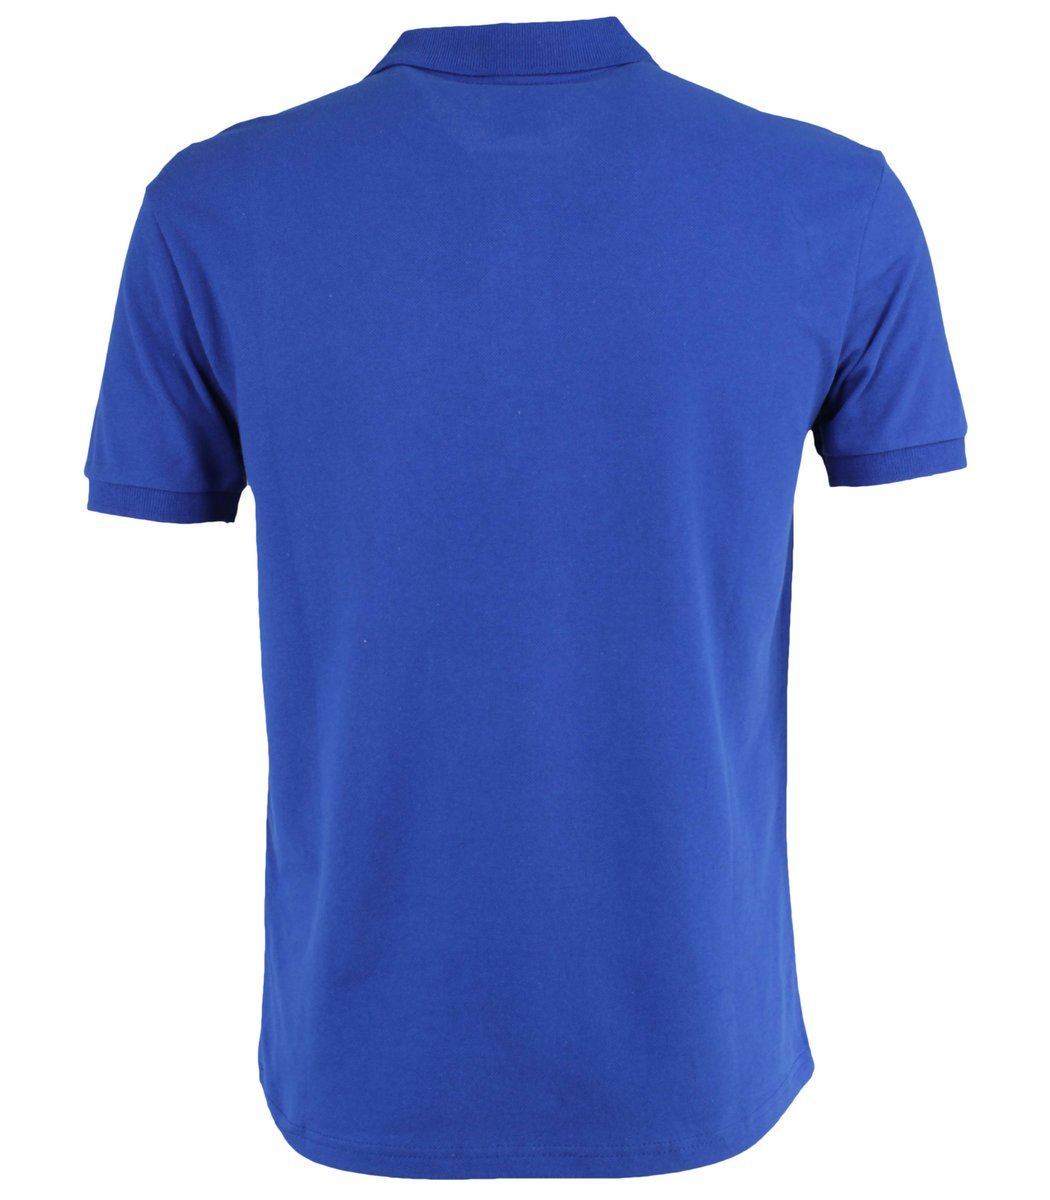 Синяя футболка поло Ralph Lauren R11